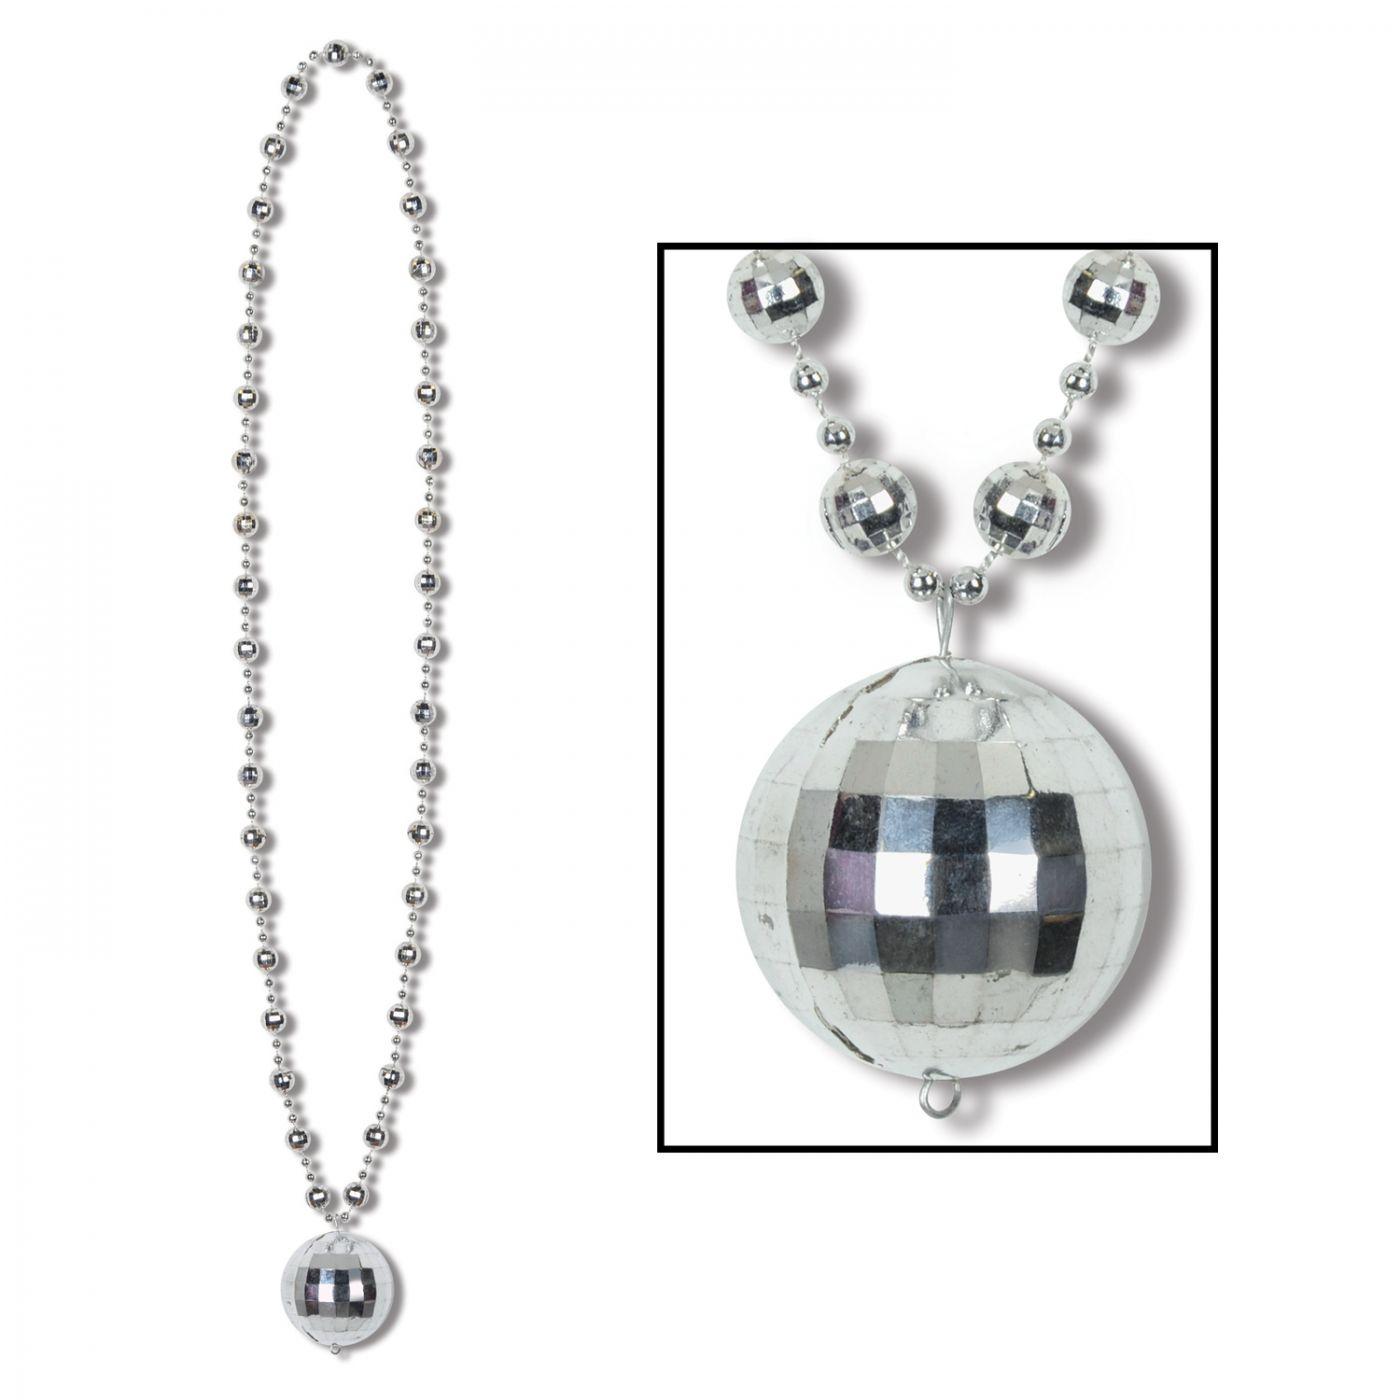 Image of Disco Ball Beads w/Disco Ball Medallion